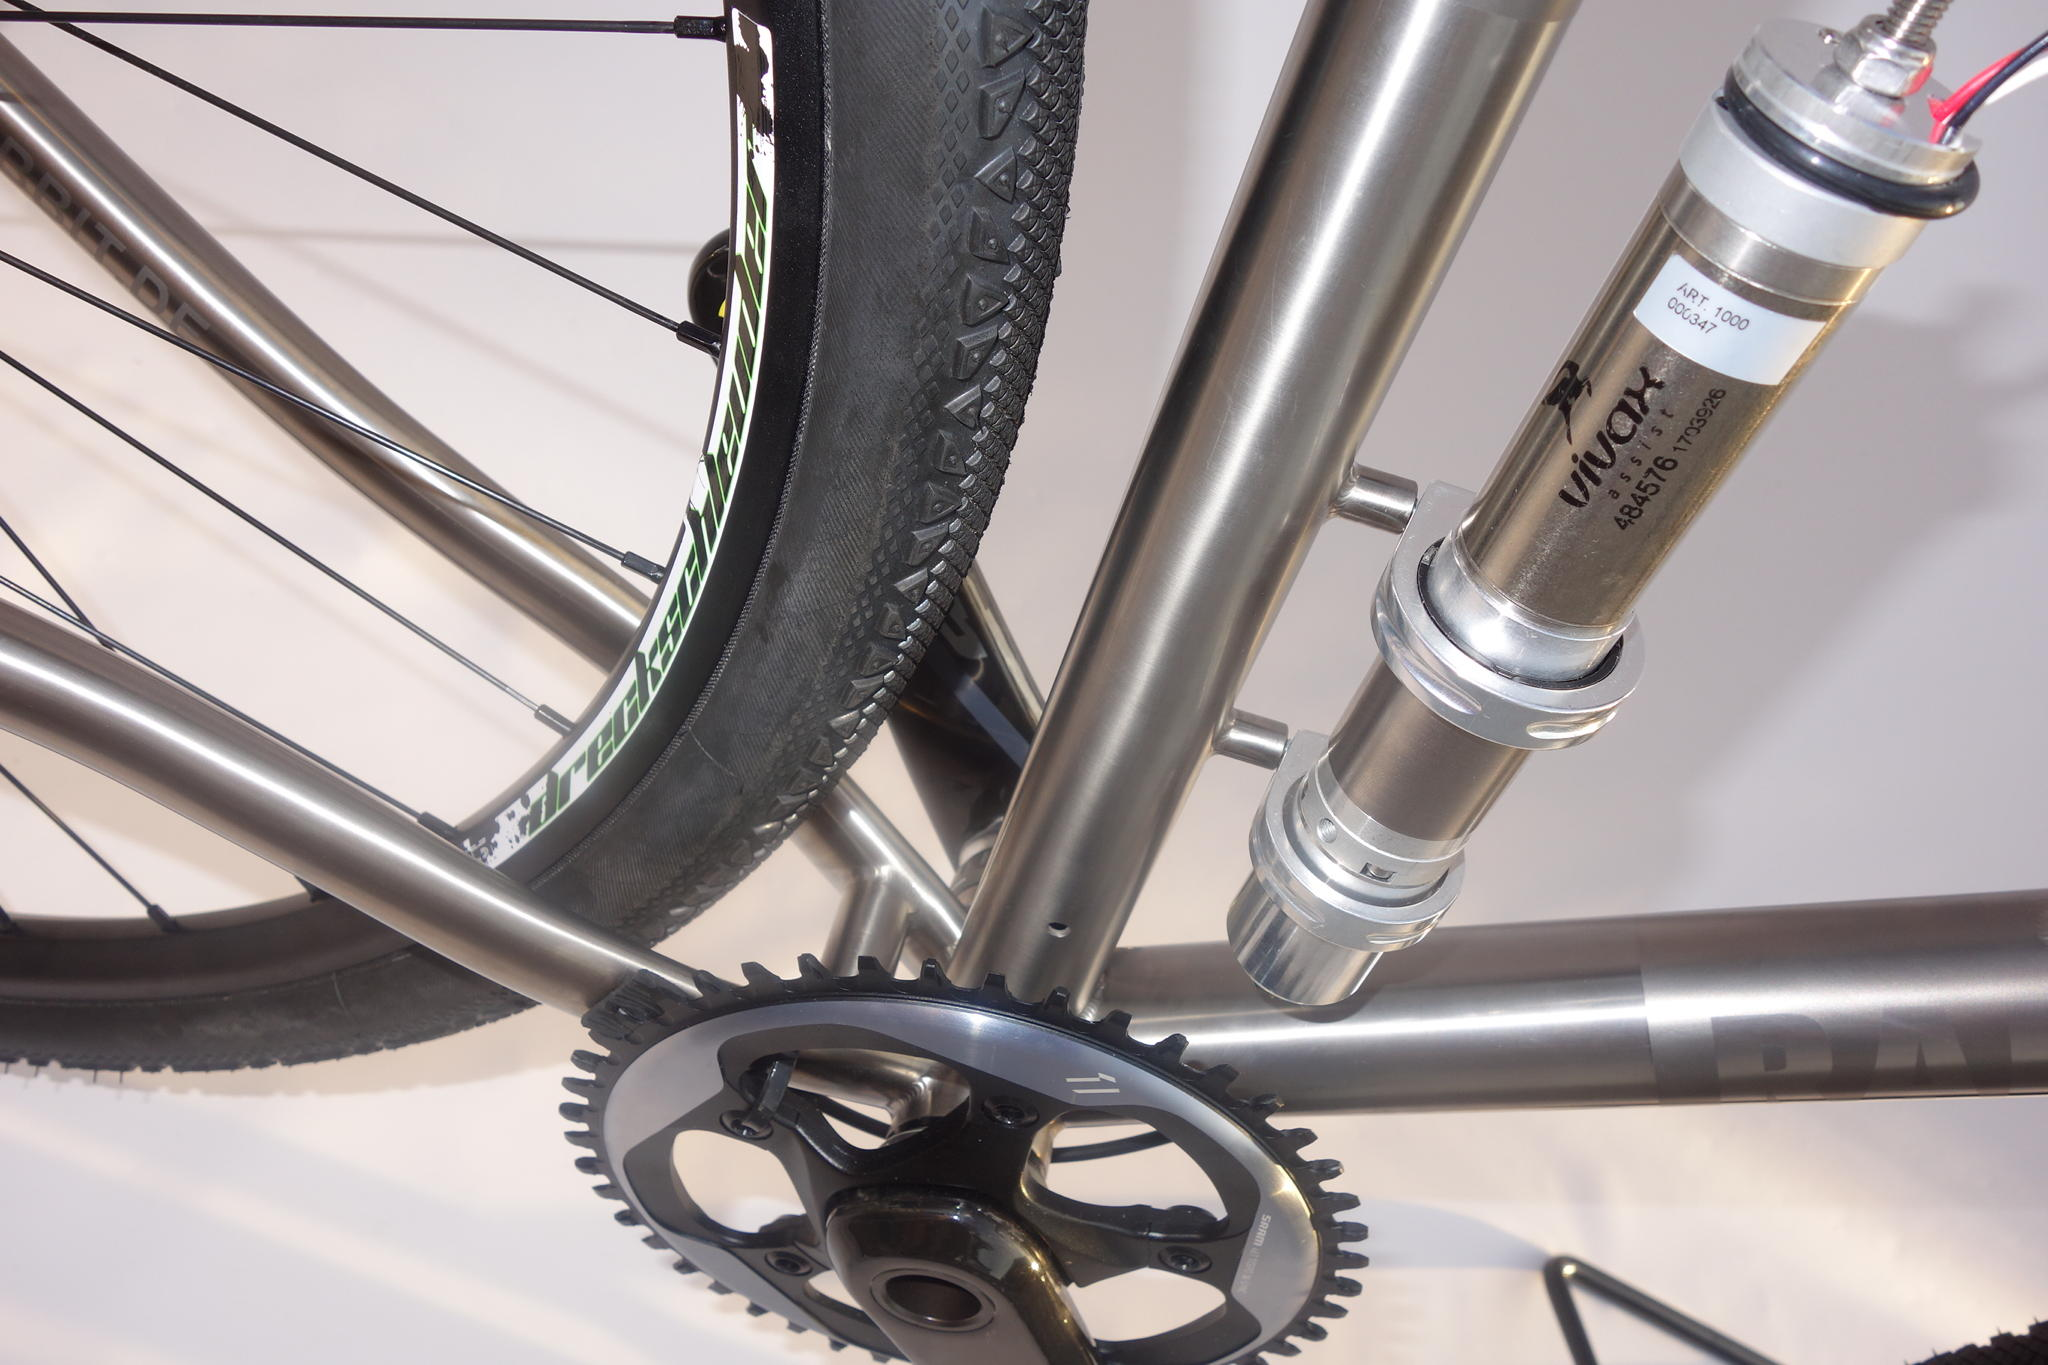 rabbit_cycles_titan_gravel_vivax_dsc03354